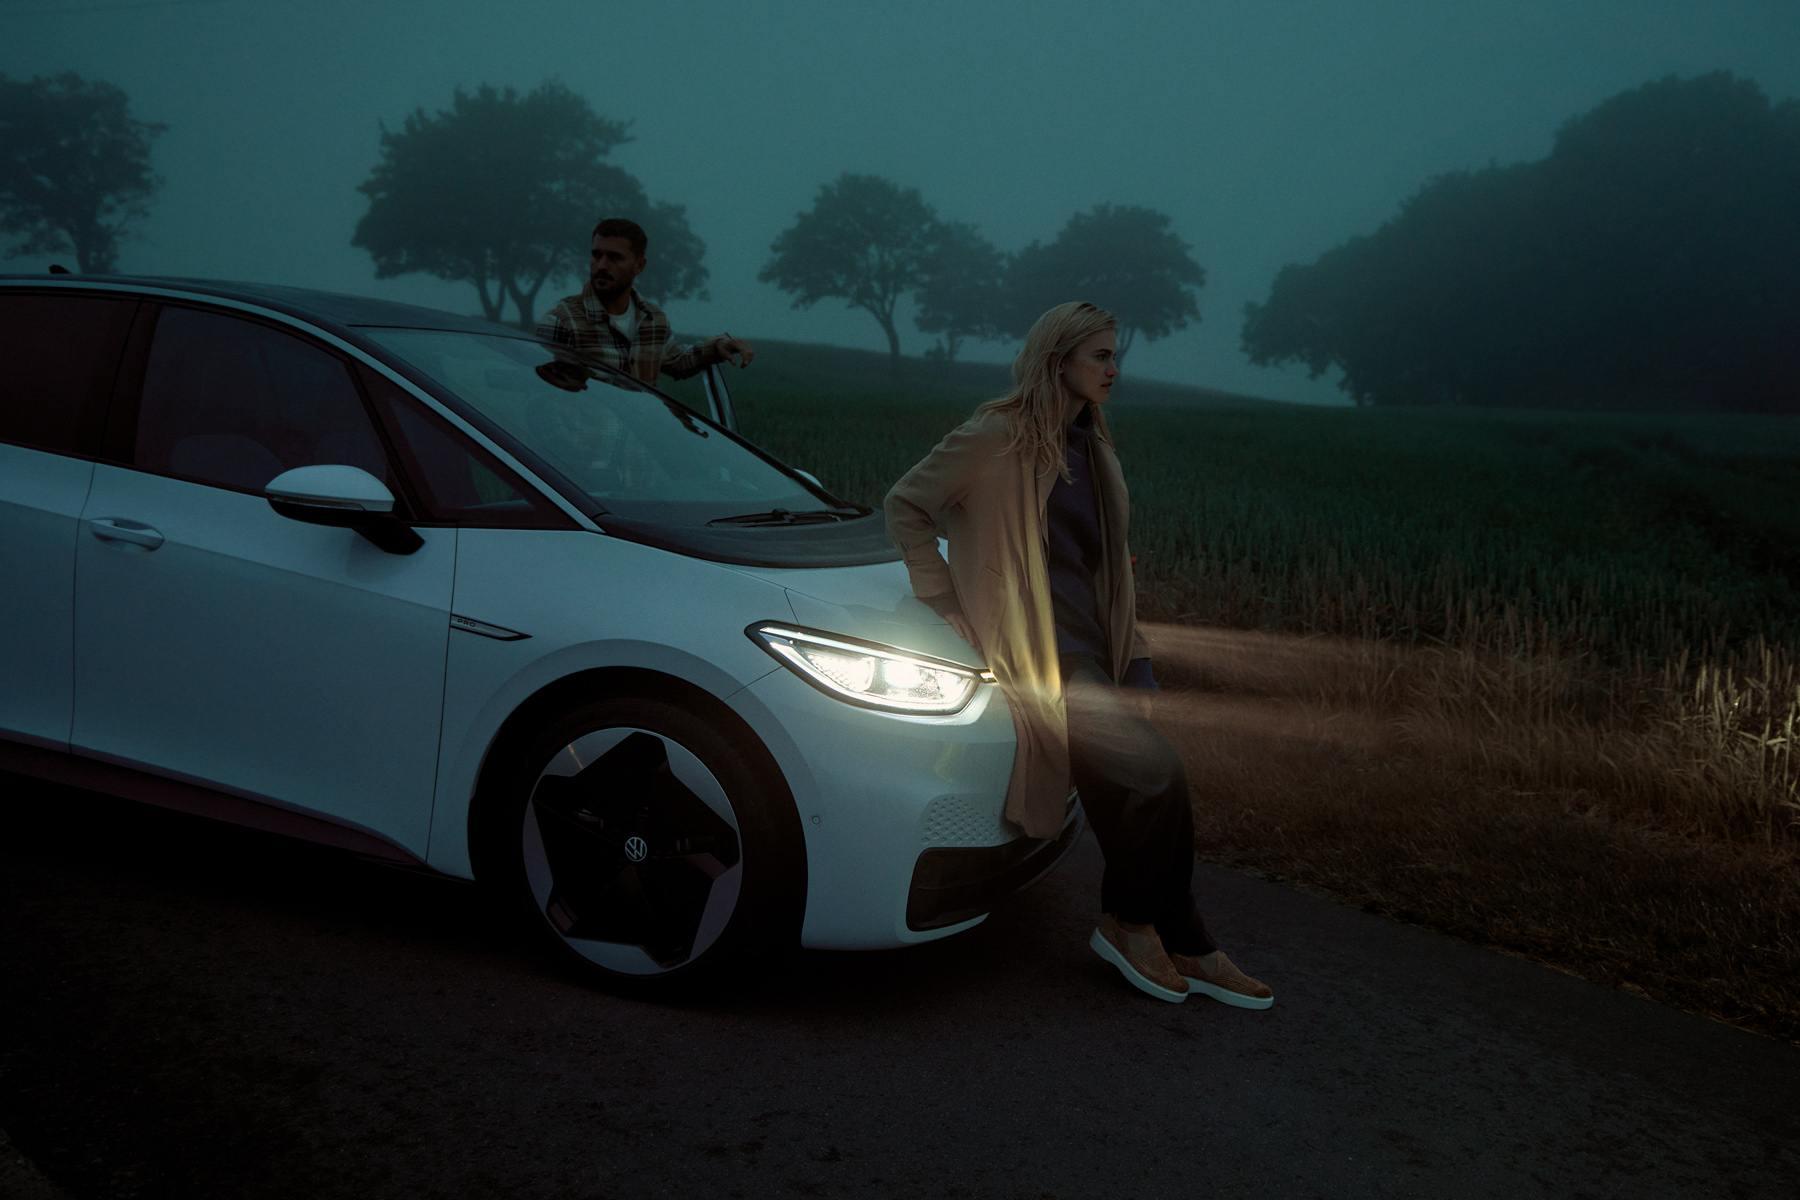 Purpose for Volkswagen by David Daub